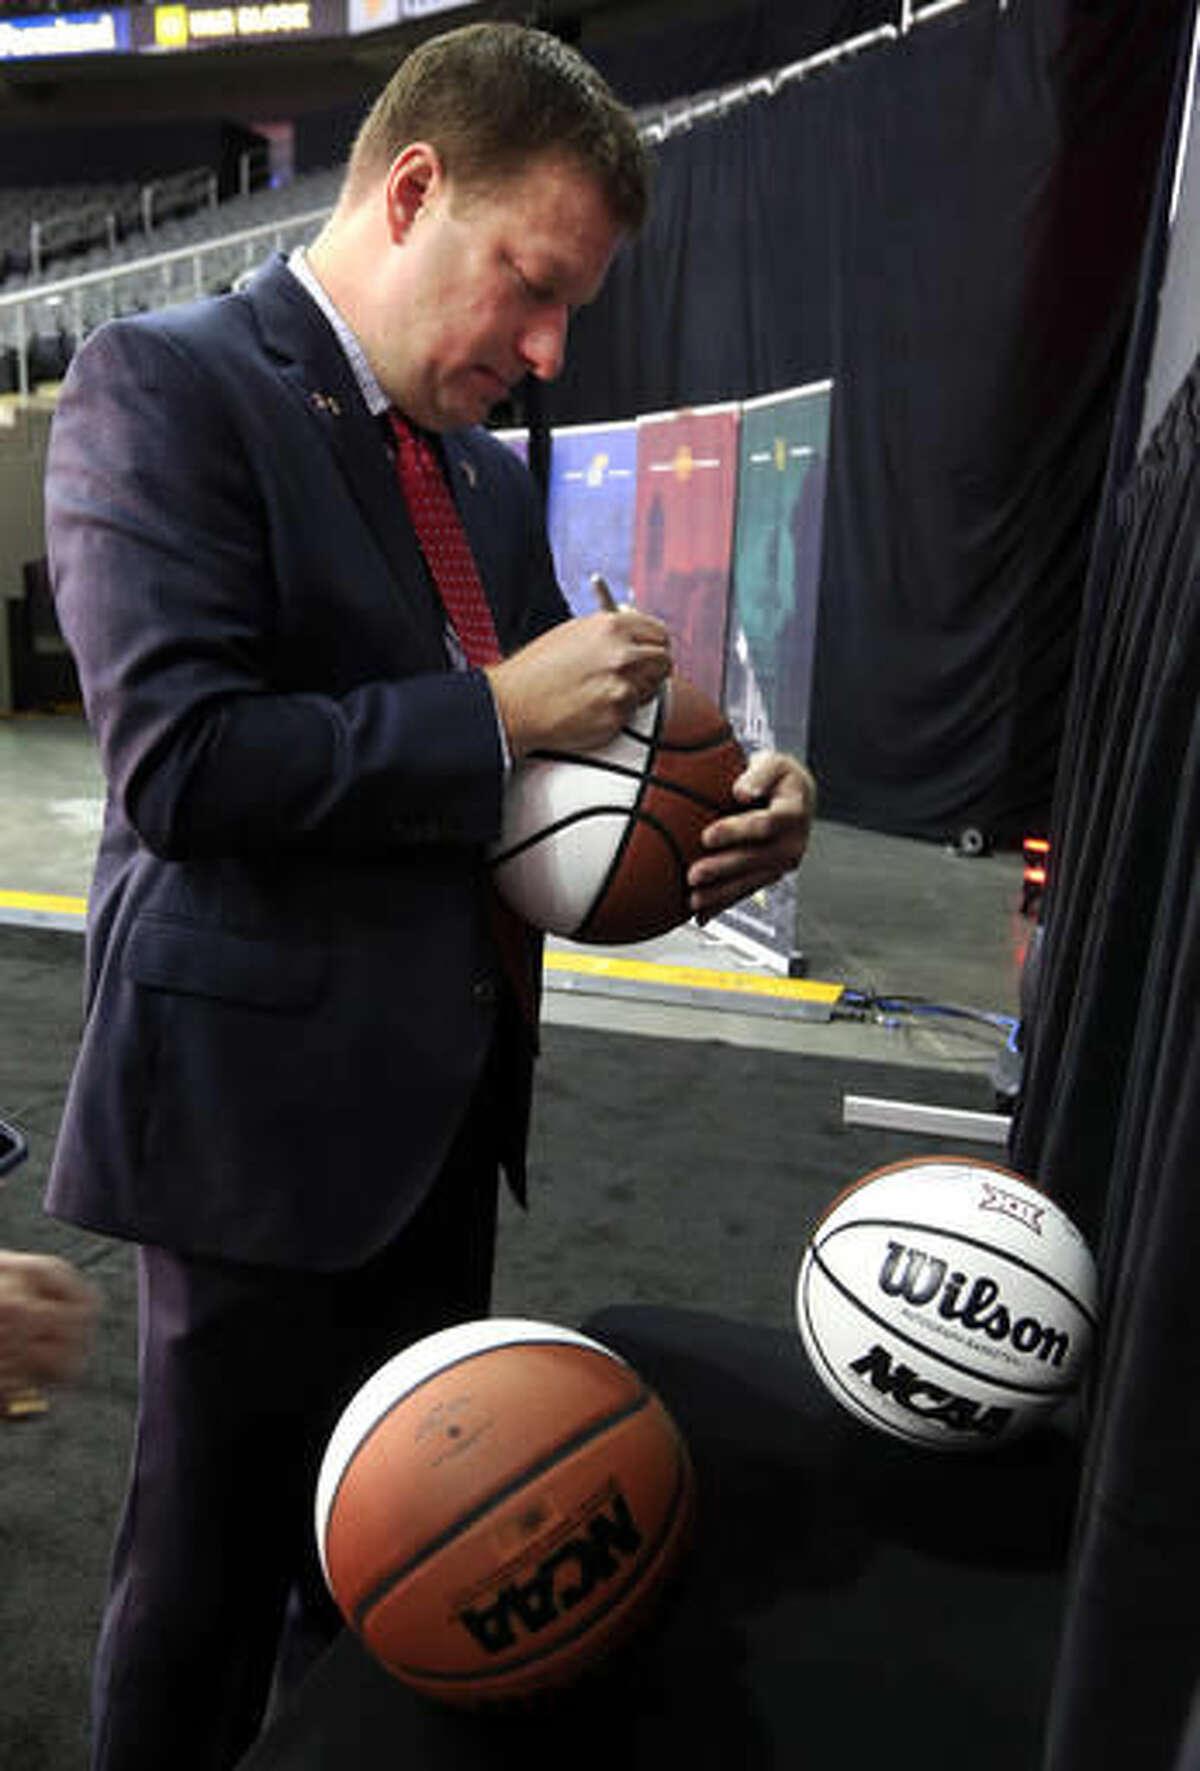 Texas Tech coach Chris Beard autographs basketballs during Big 12 NCAA college basketball media day in Kansas City, Mo., Tuesday, Oct. 25, 2016. (AP Photo/Orlin Wagner)